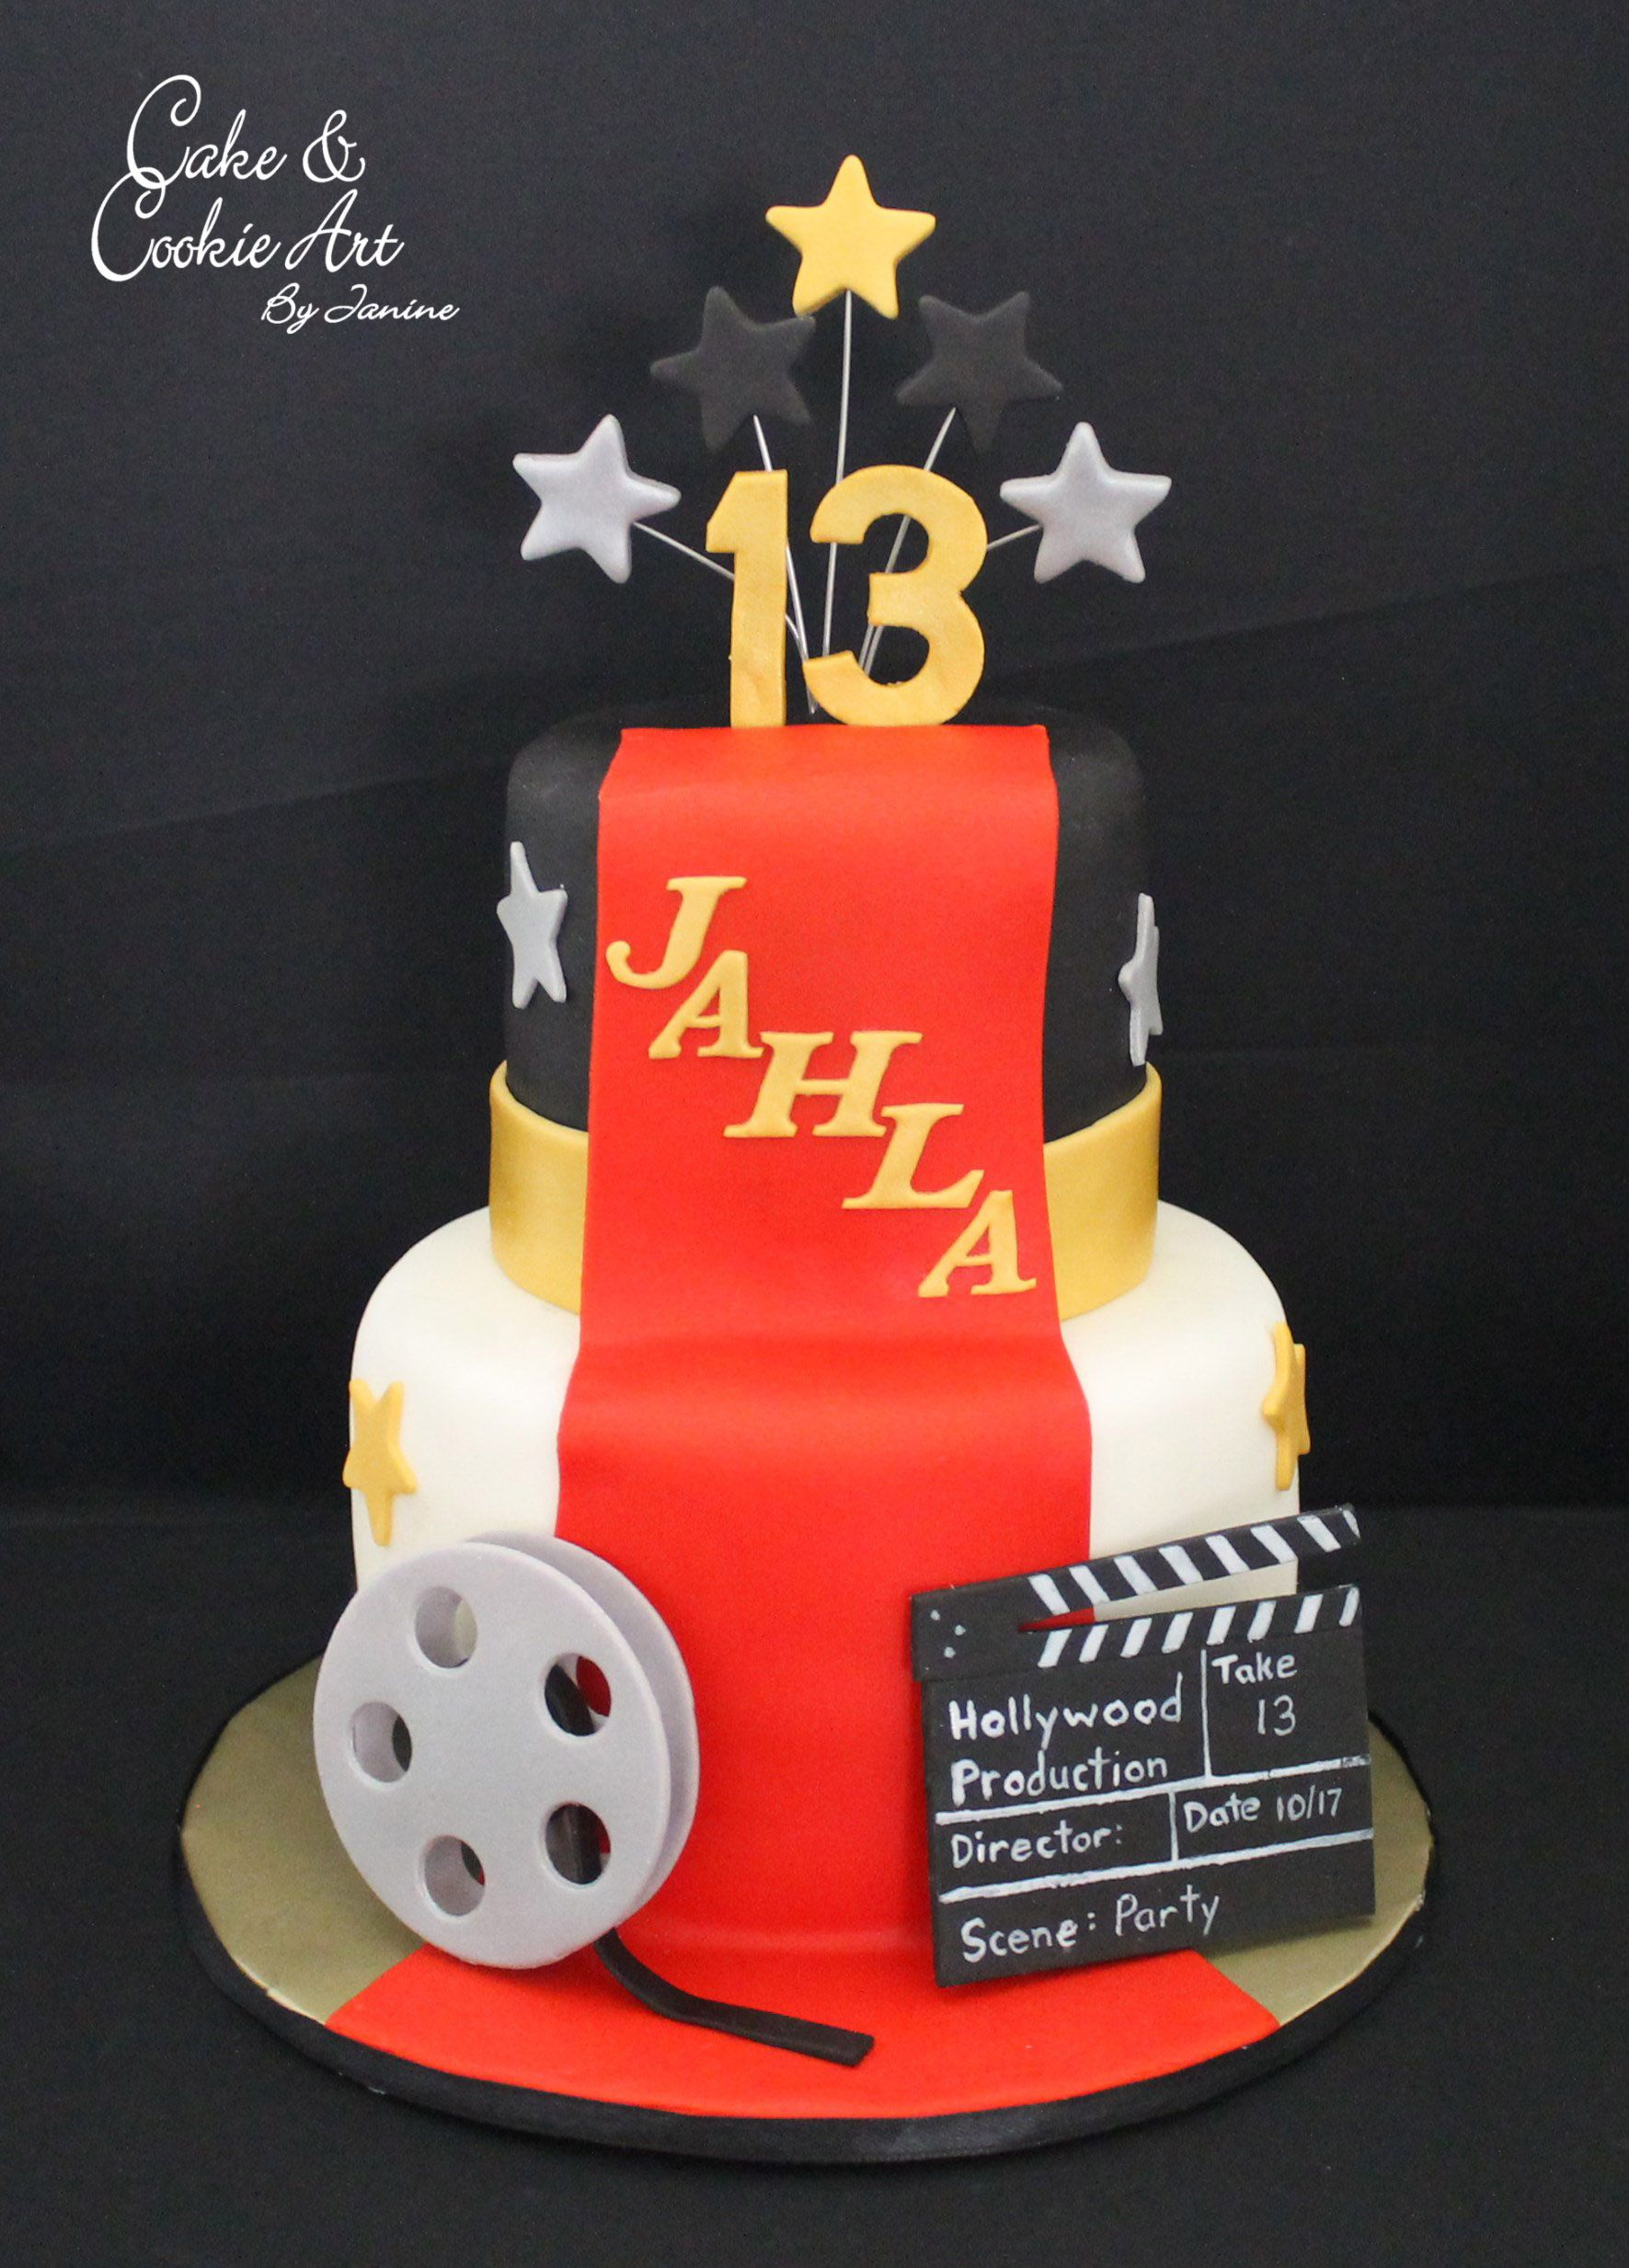 Hollywood theme cake cake themed cakes cake cookies